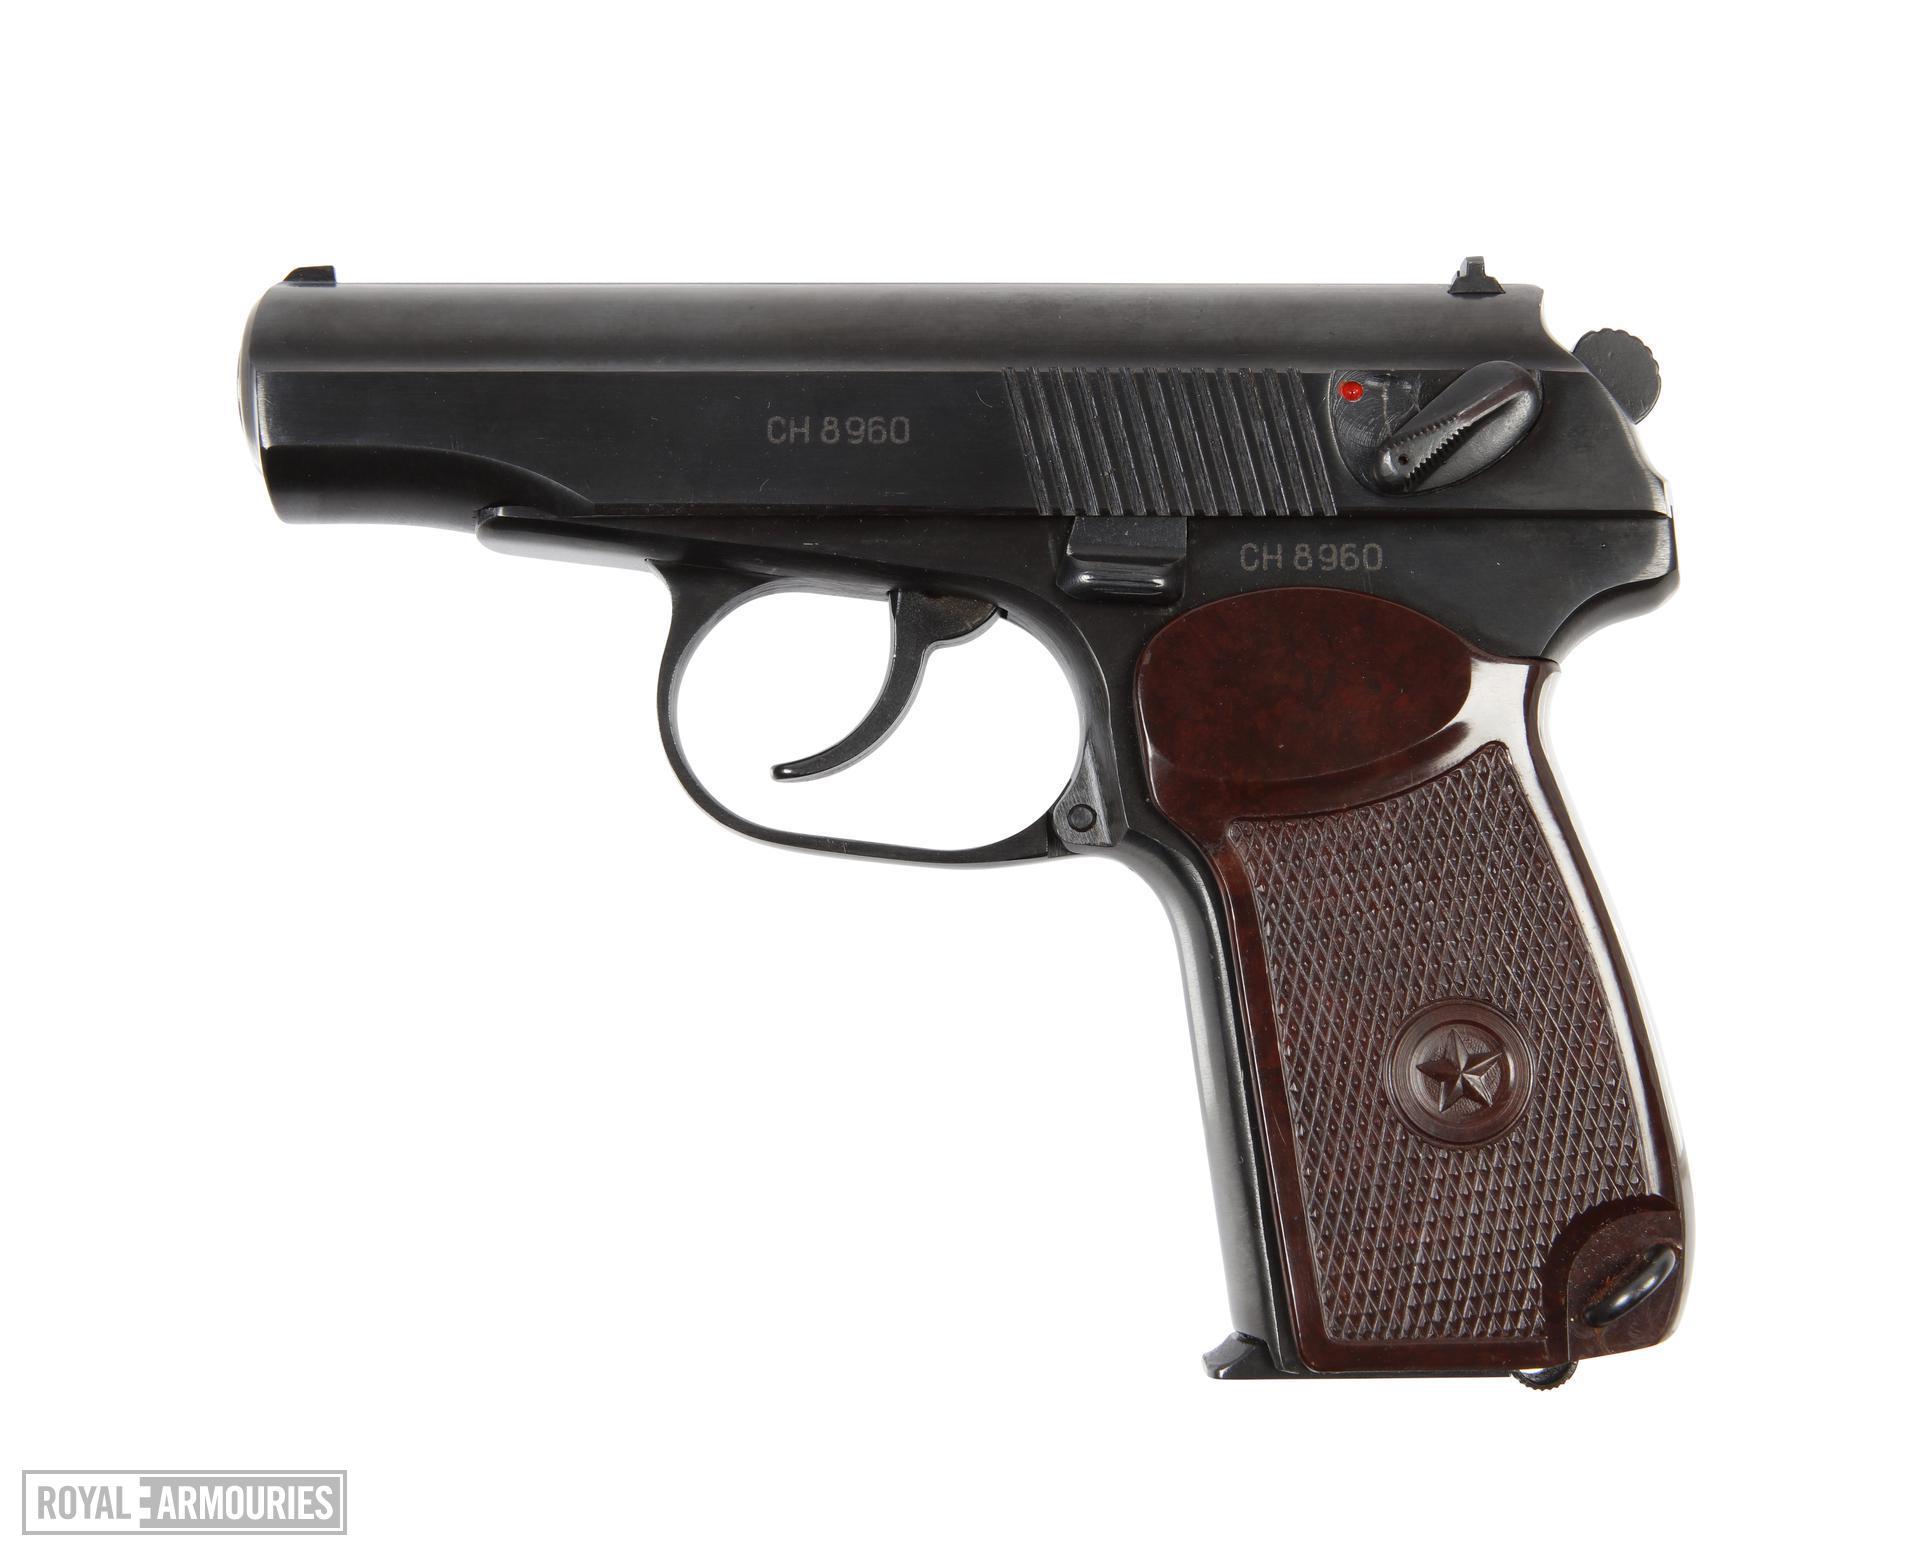 Centrefire self-loading pistol, Makarov PM, Russia, made 1976